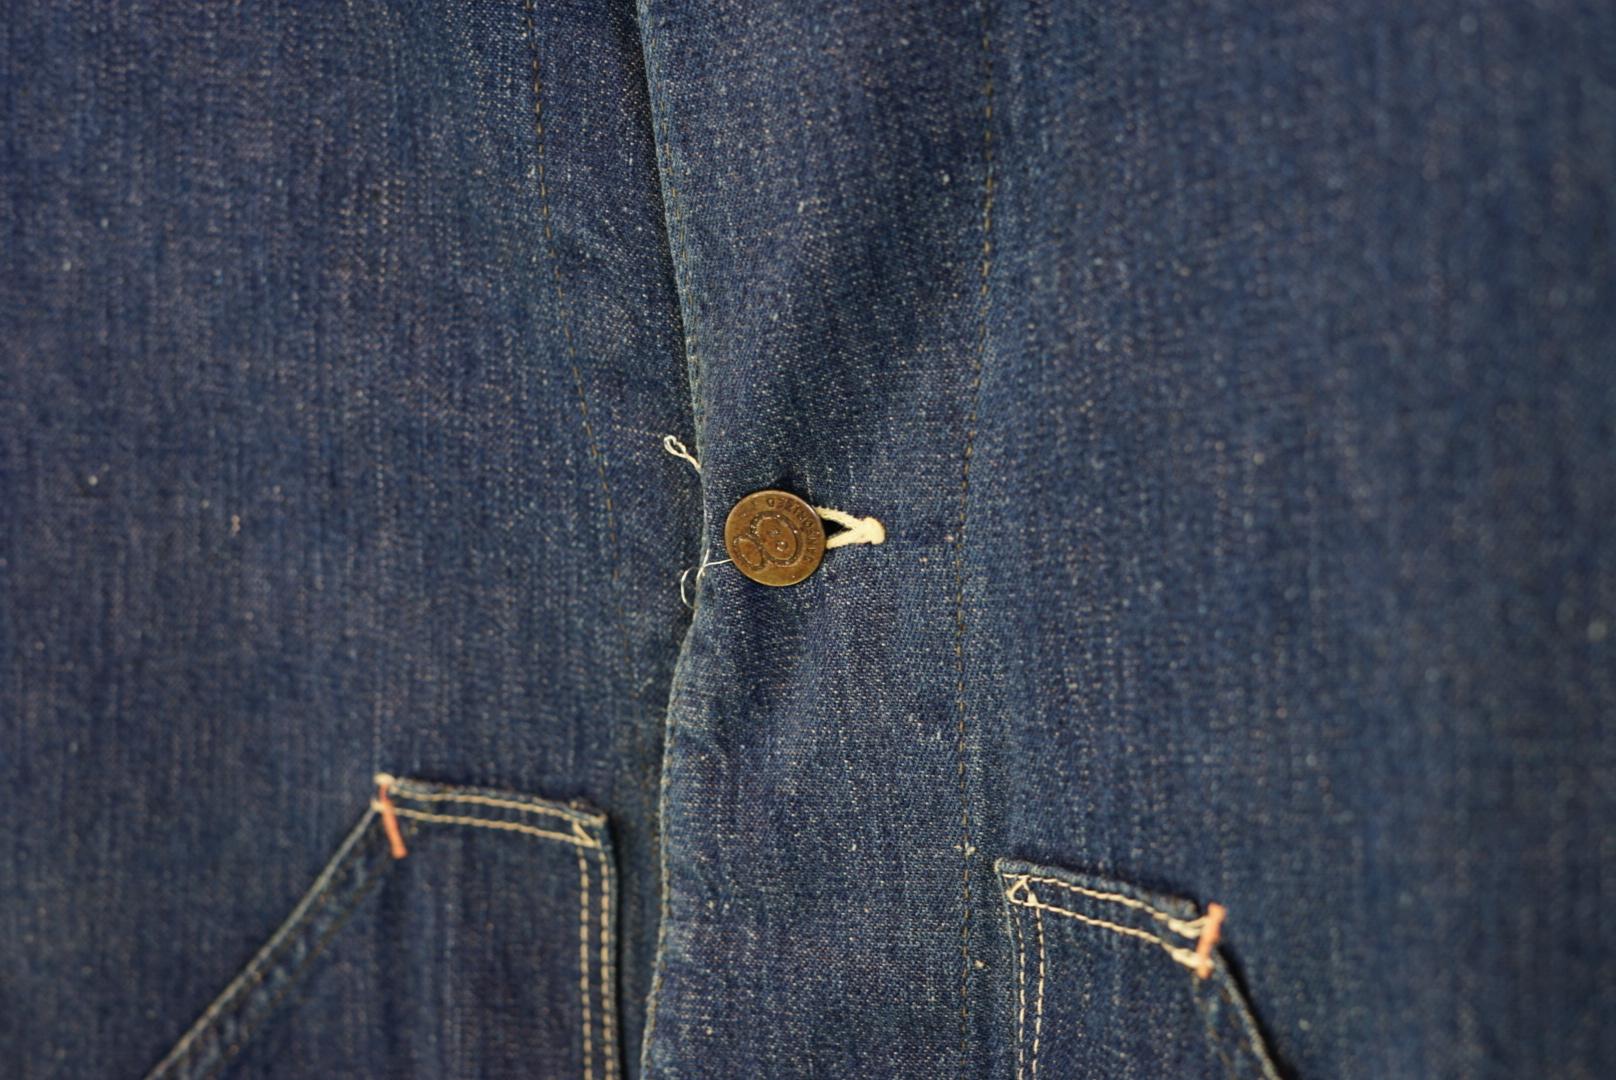 1950's 8オンス ショートカバーオール デニムジャケット